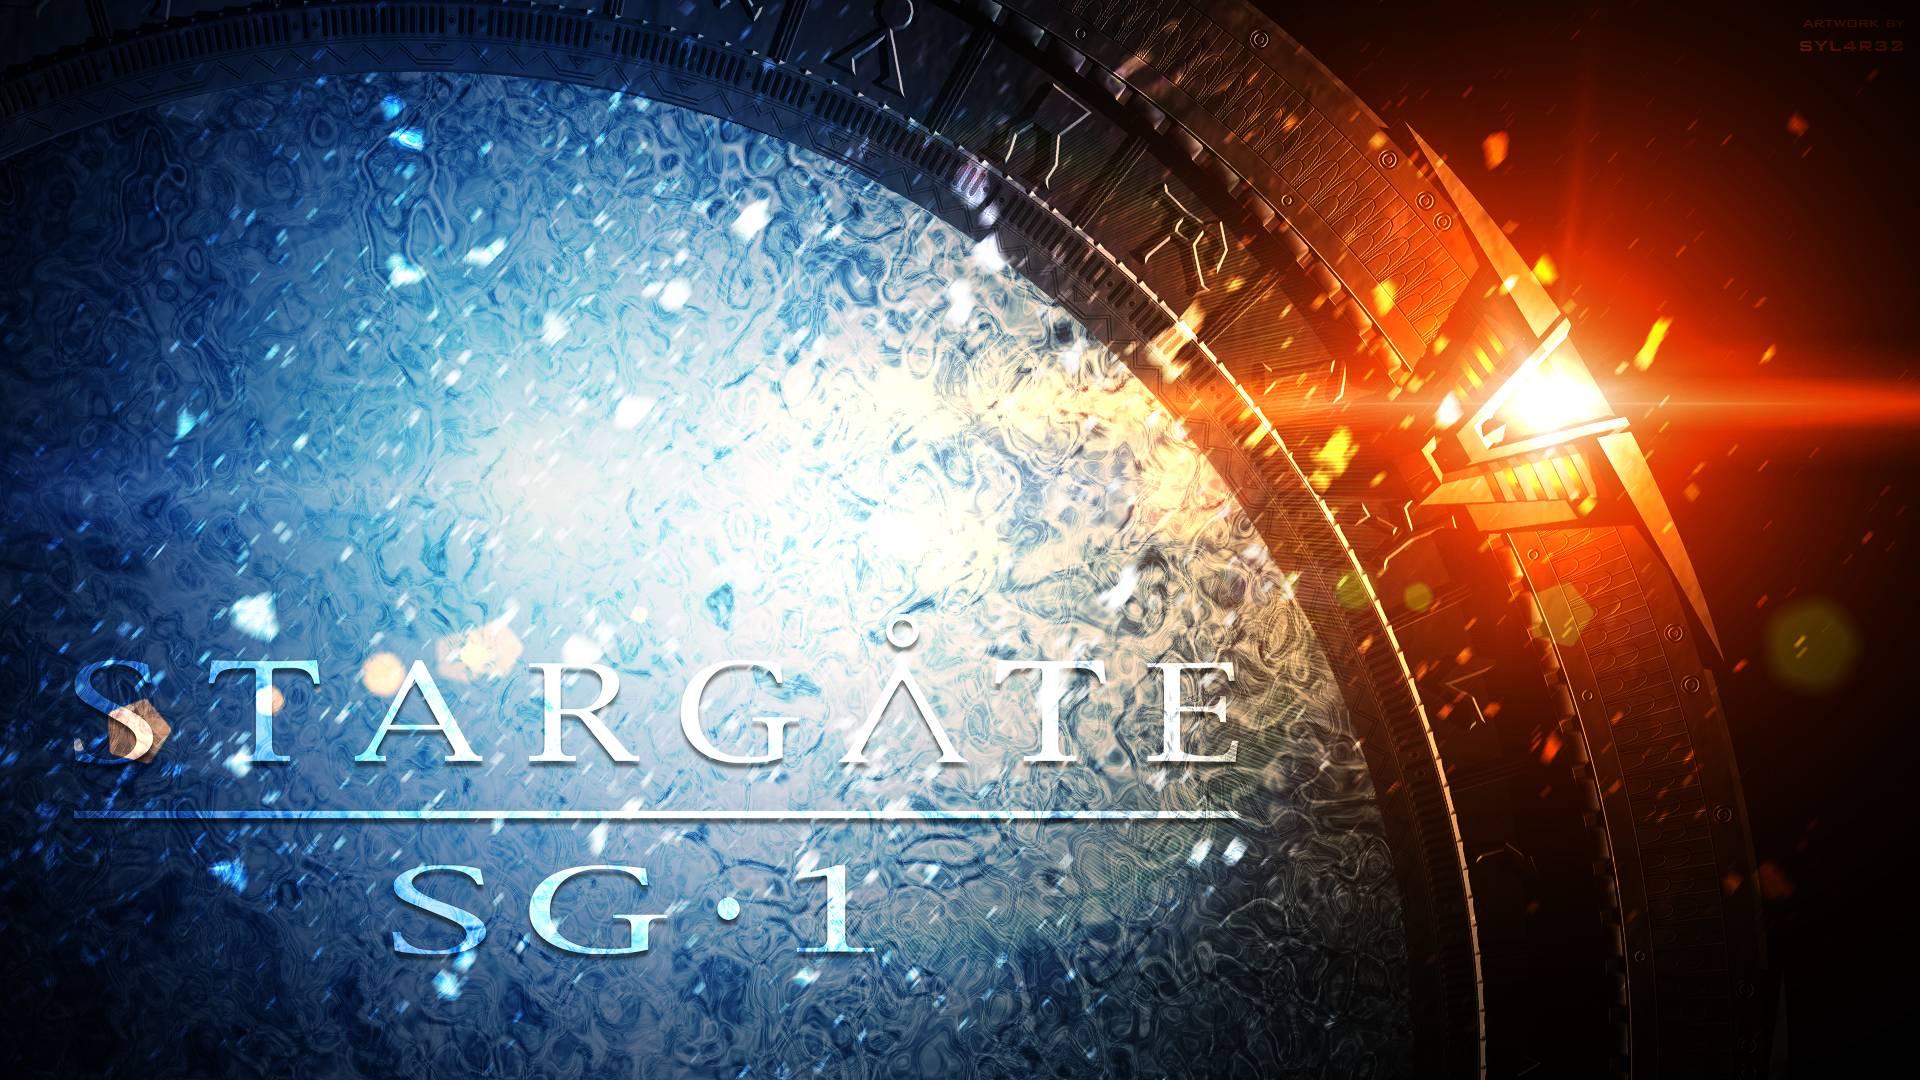 stargate wallpaper universe space - photo #33